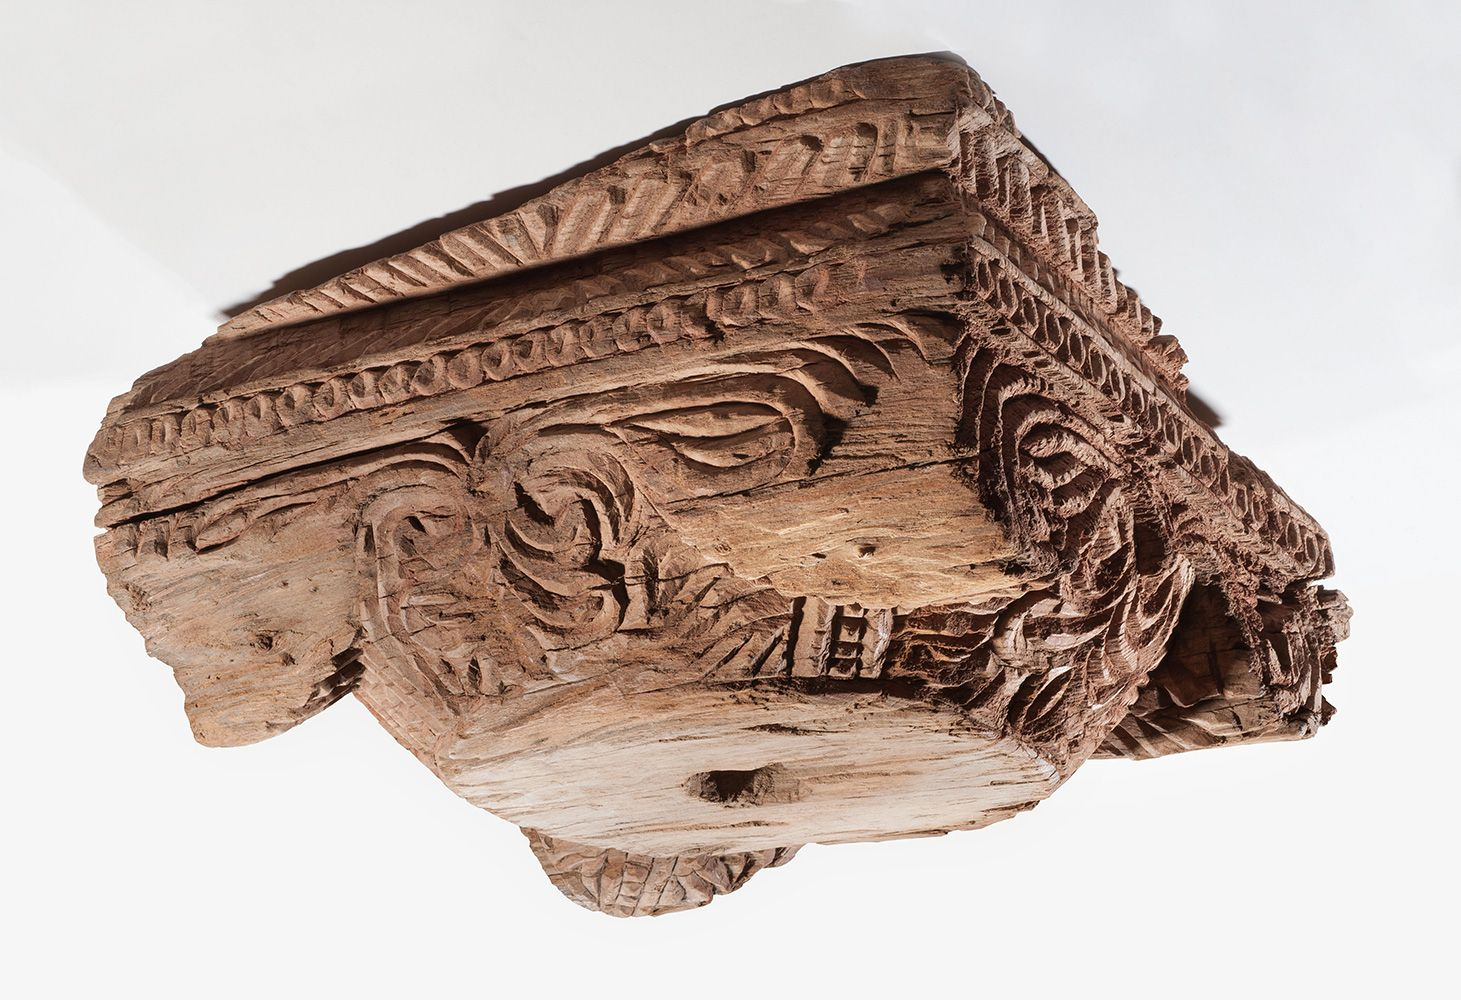 Geschnitztes Holzkapitell aus Ruine K, Kočo, Xinjiang, China, 8. Jh. © Staatliche Museen zu Berlin, Museum für Asiatische Kunst / Jürgen Liepe